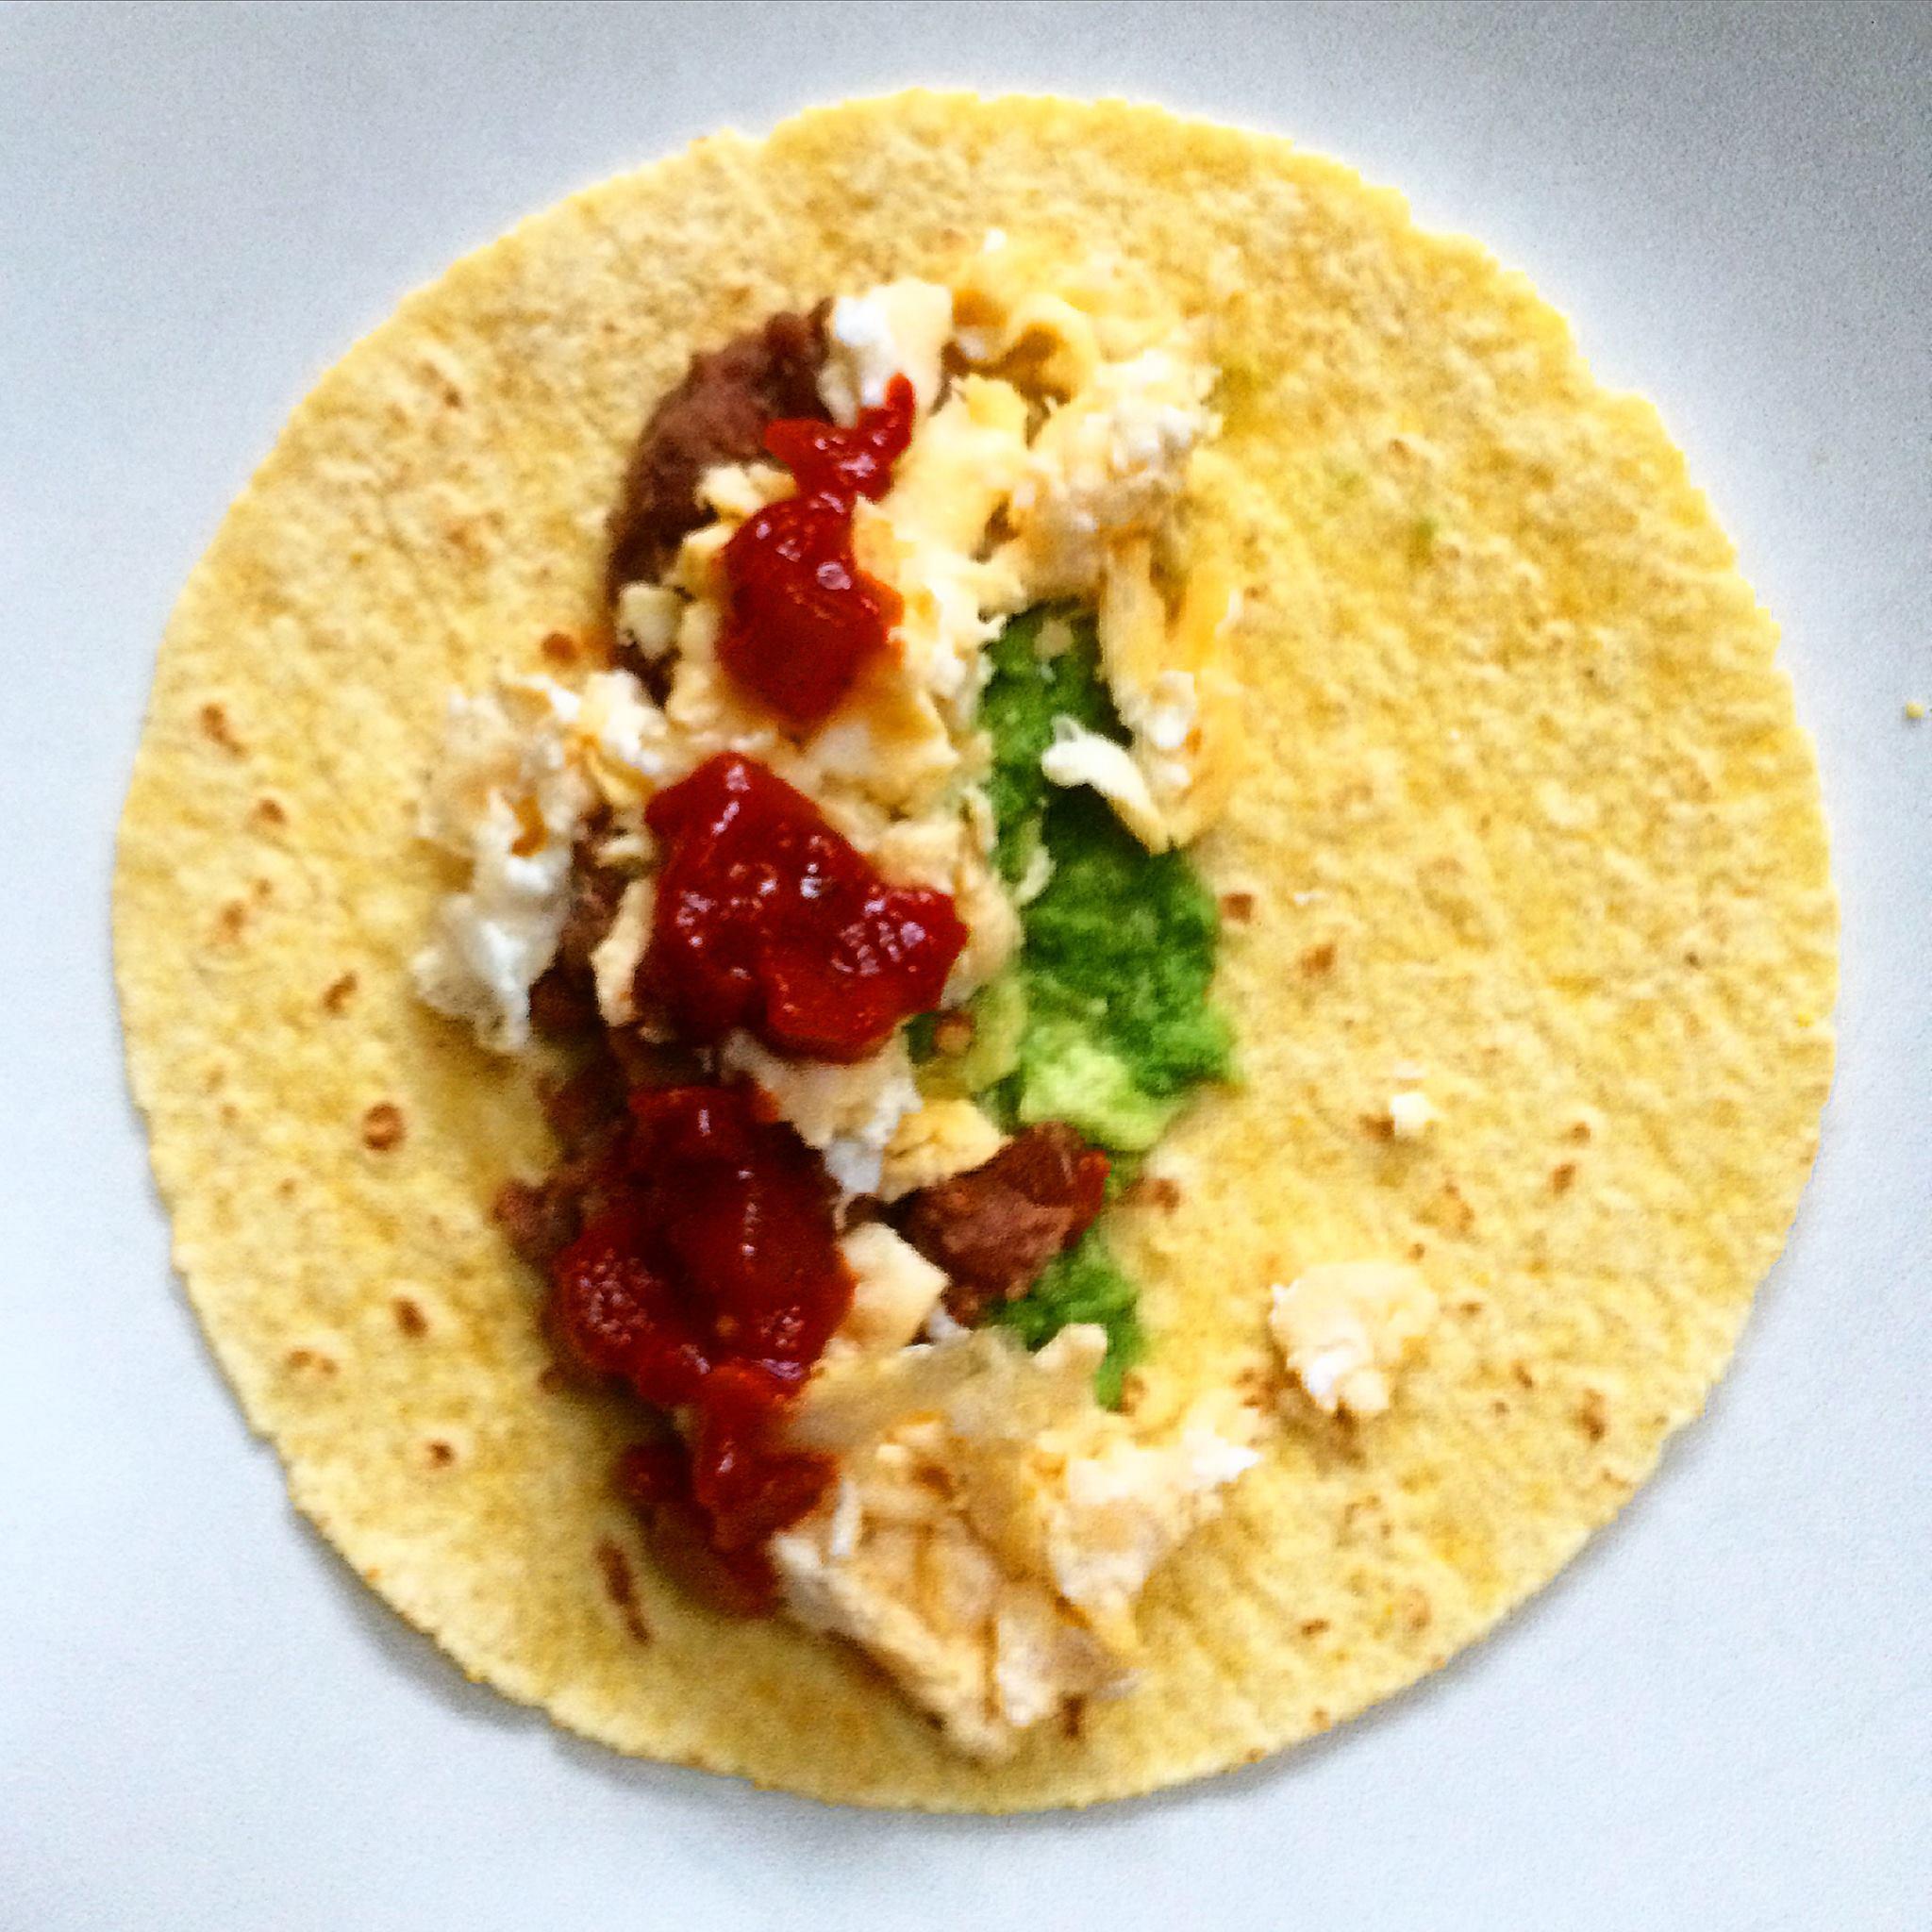 Breakfast burrito. Mmm.